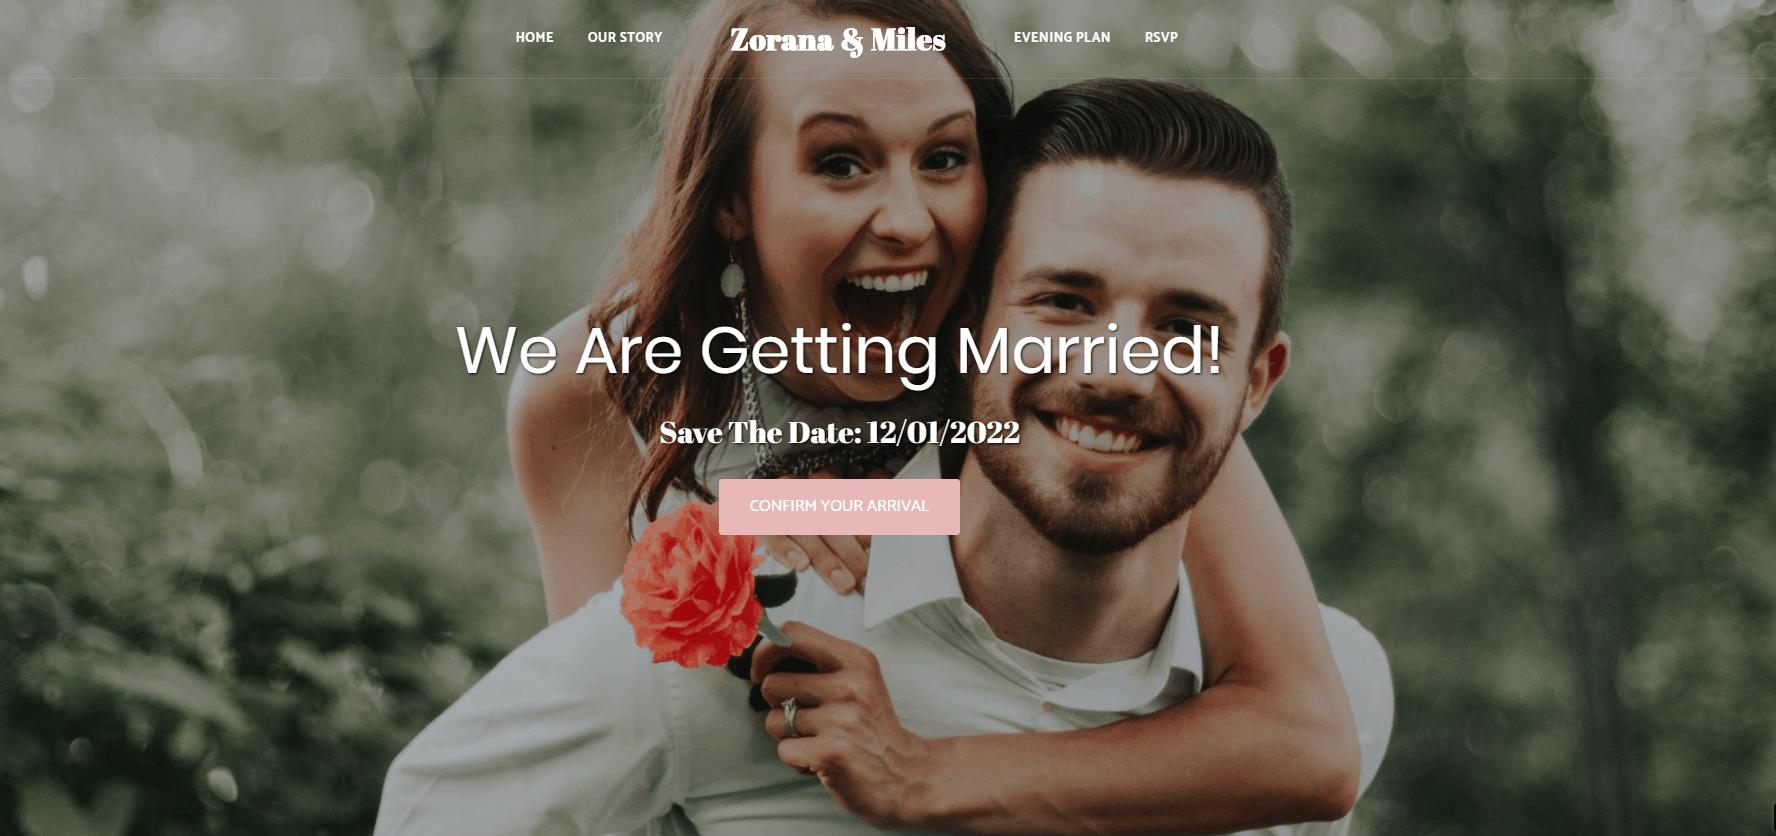 Site123 Zorana & Miles wedding template